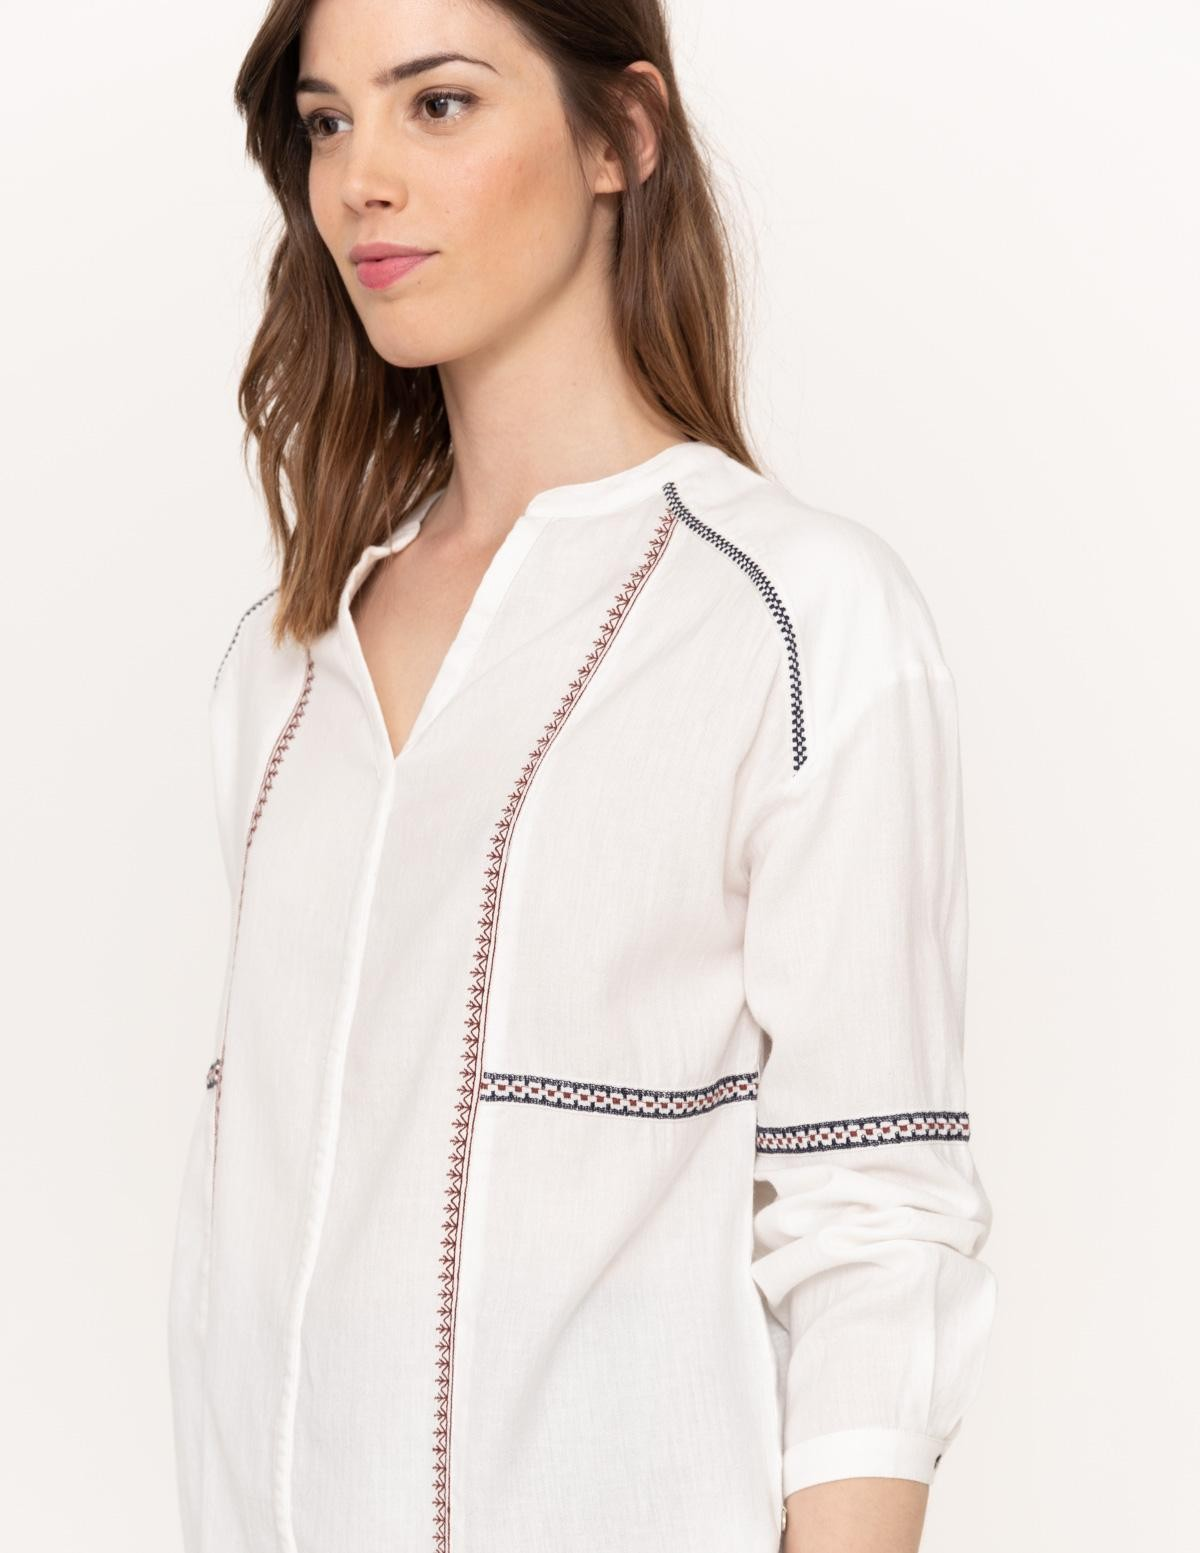 Camisa cuello mao bordados - Ítem2